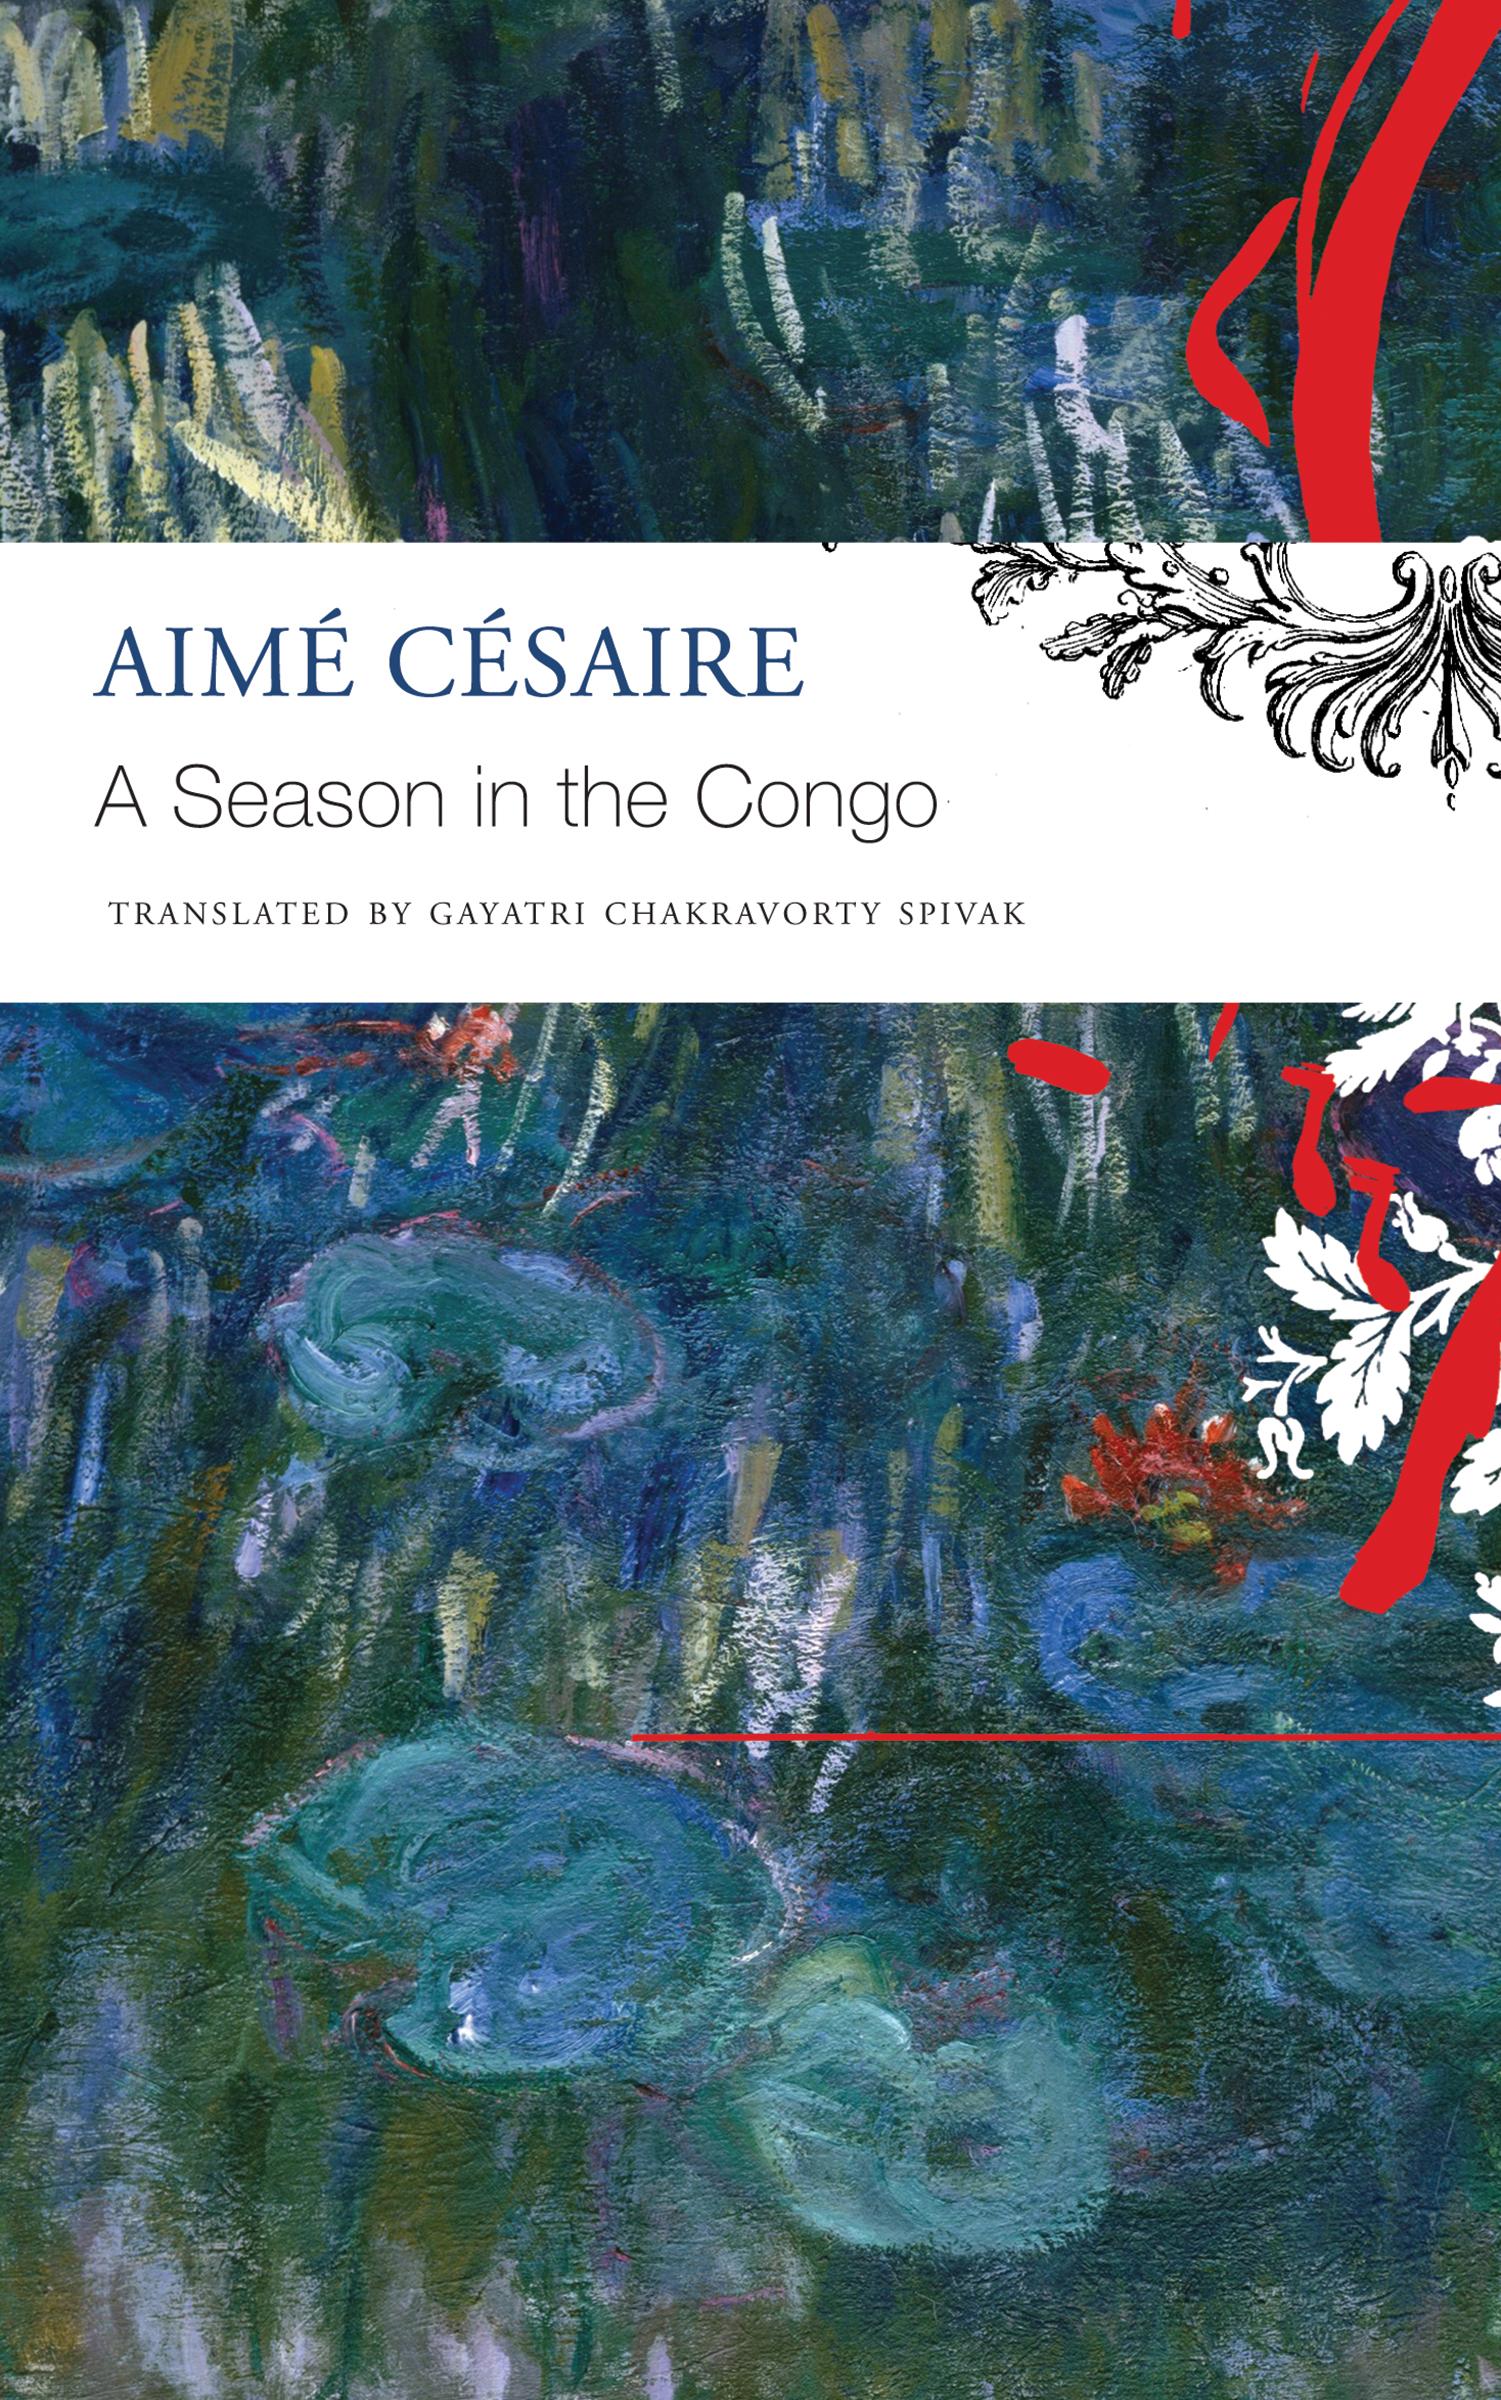 Season in the Congo by Aimé Césaire | Seagull Books